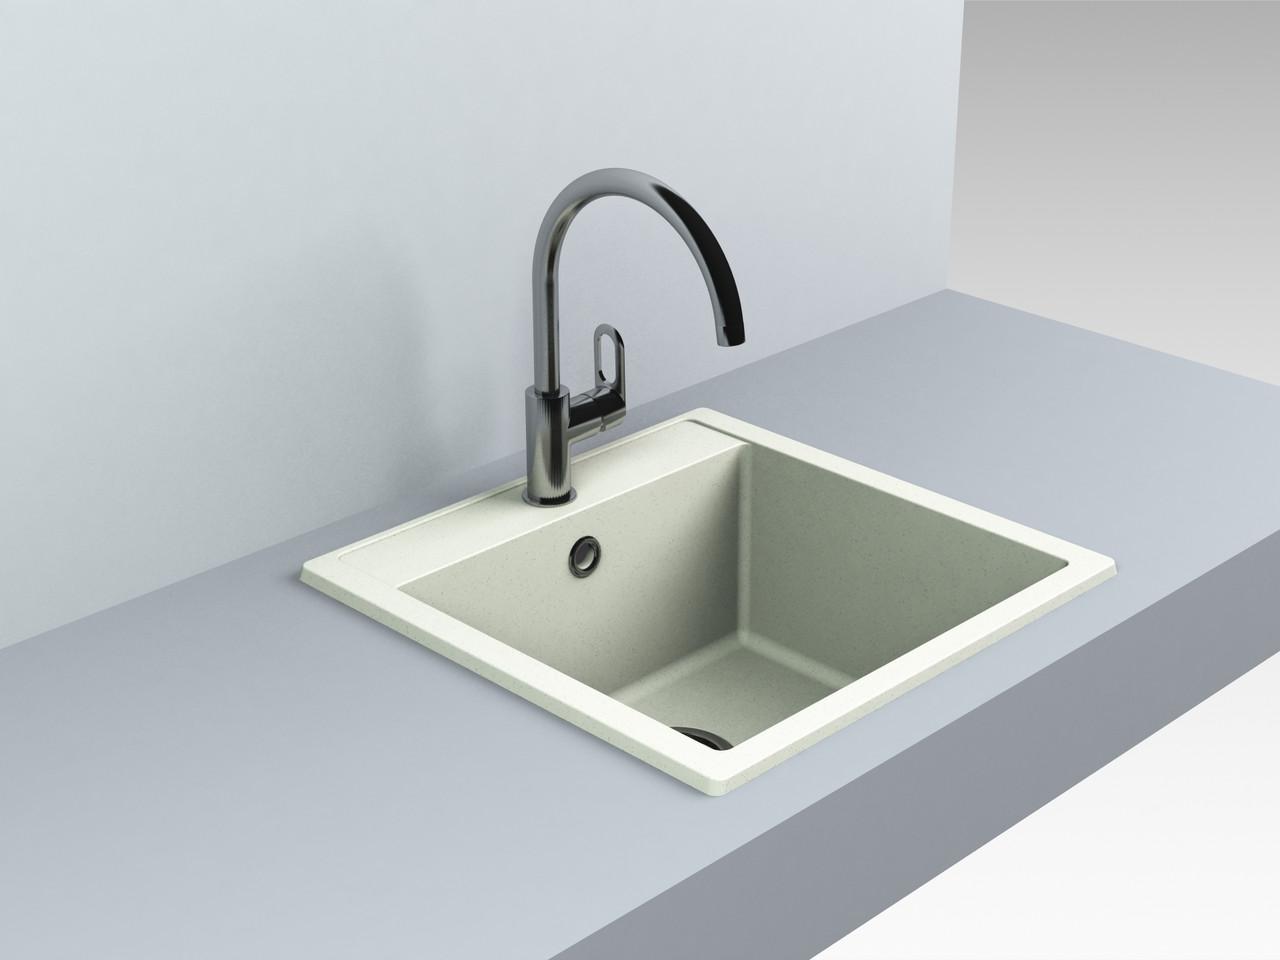 Кварцевая мойка для кухни 509*495*227 мм Miraggio Bodrum 510 жасмин